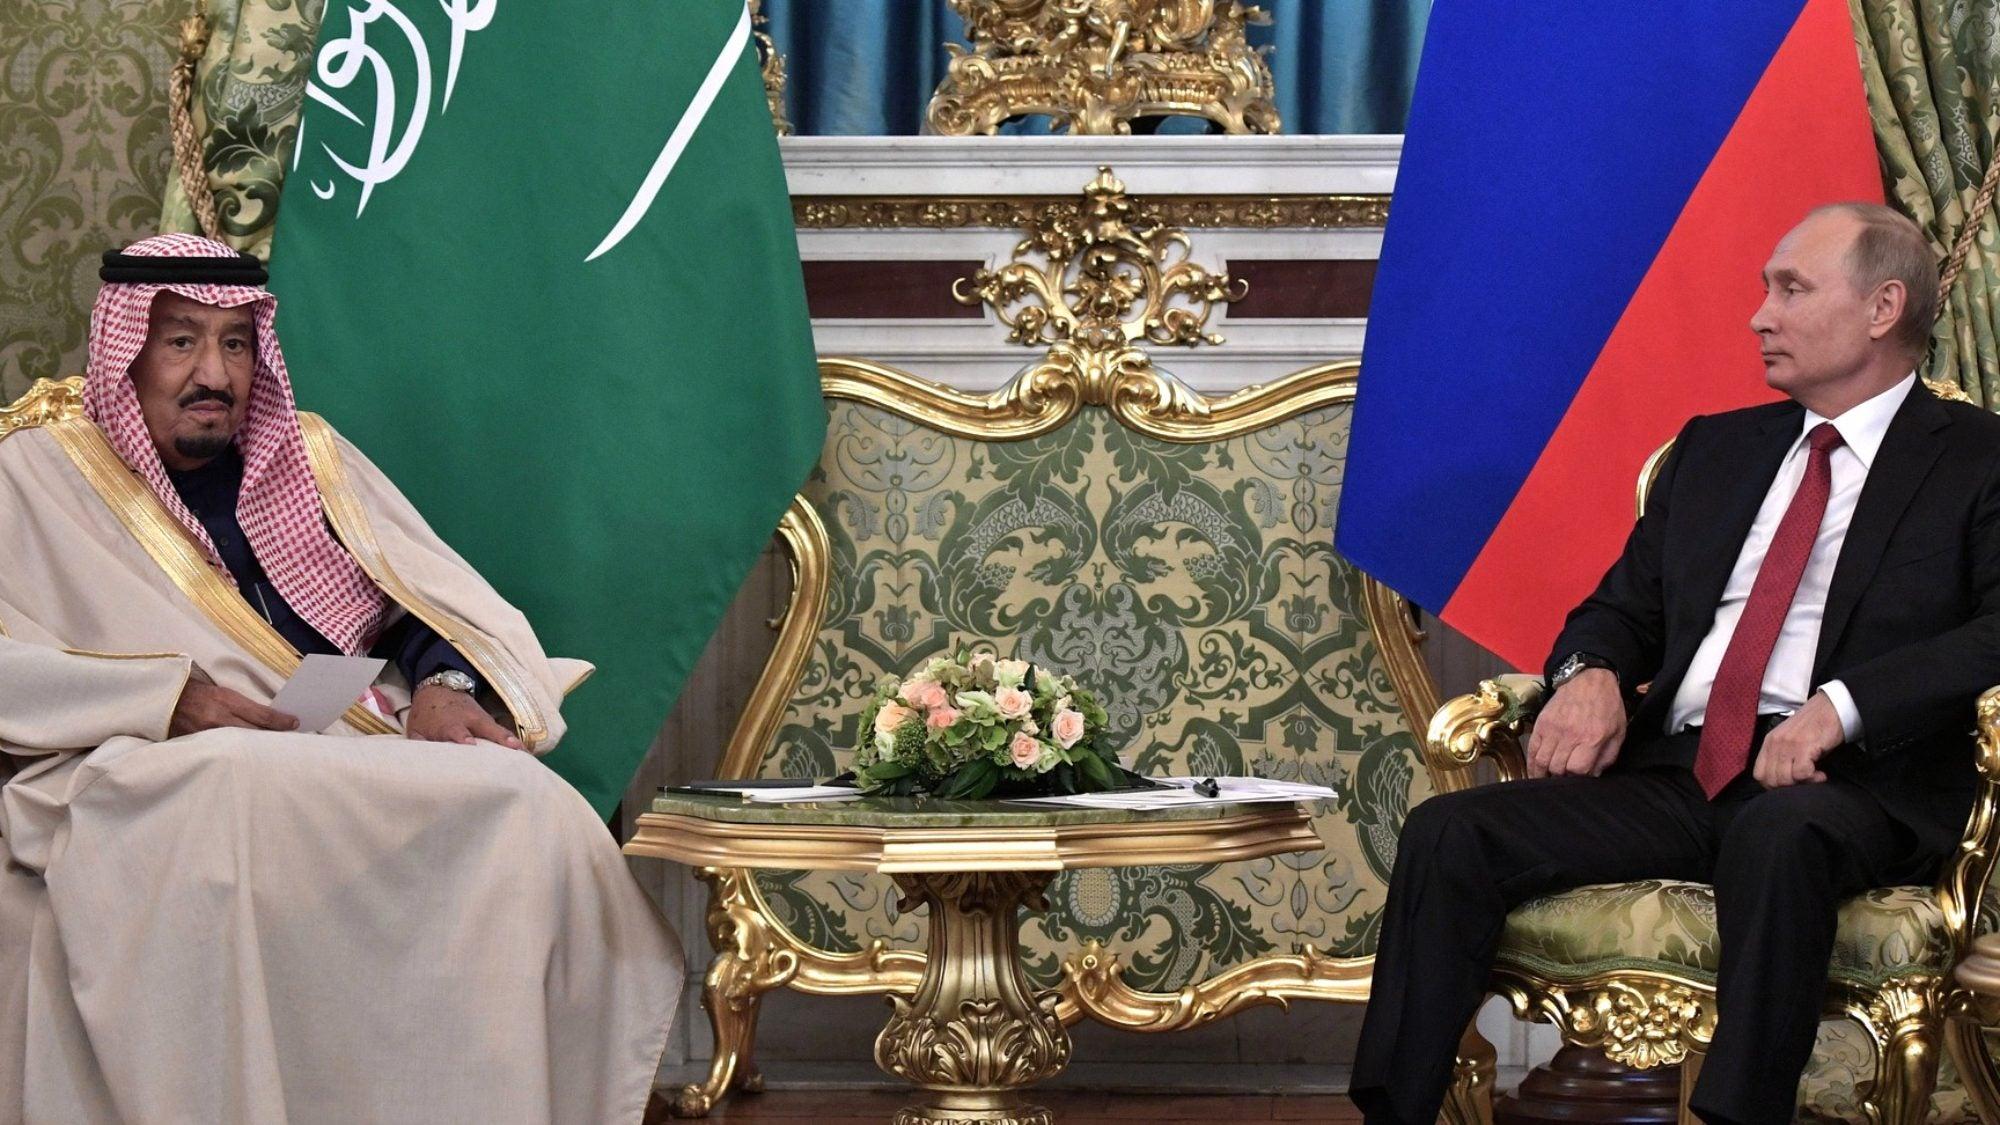 Russian and Saudi state leaders